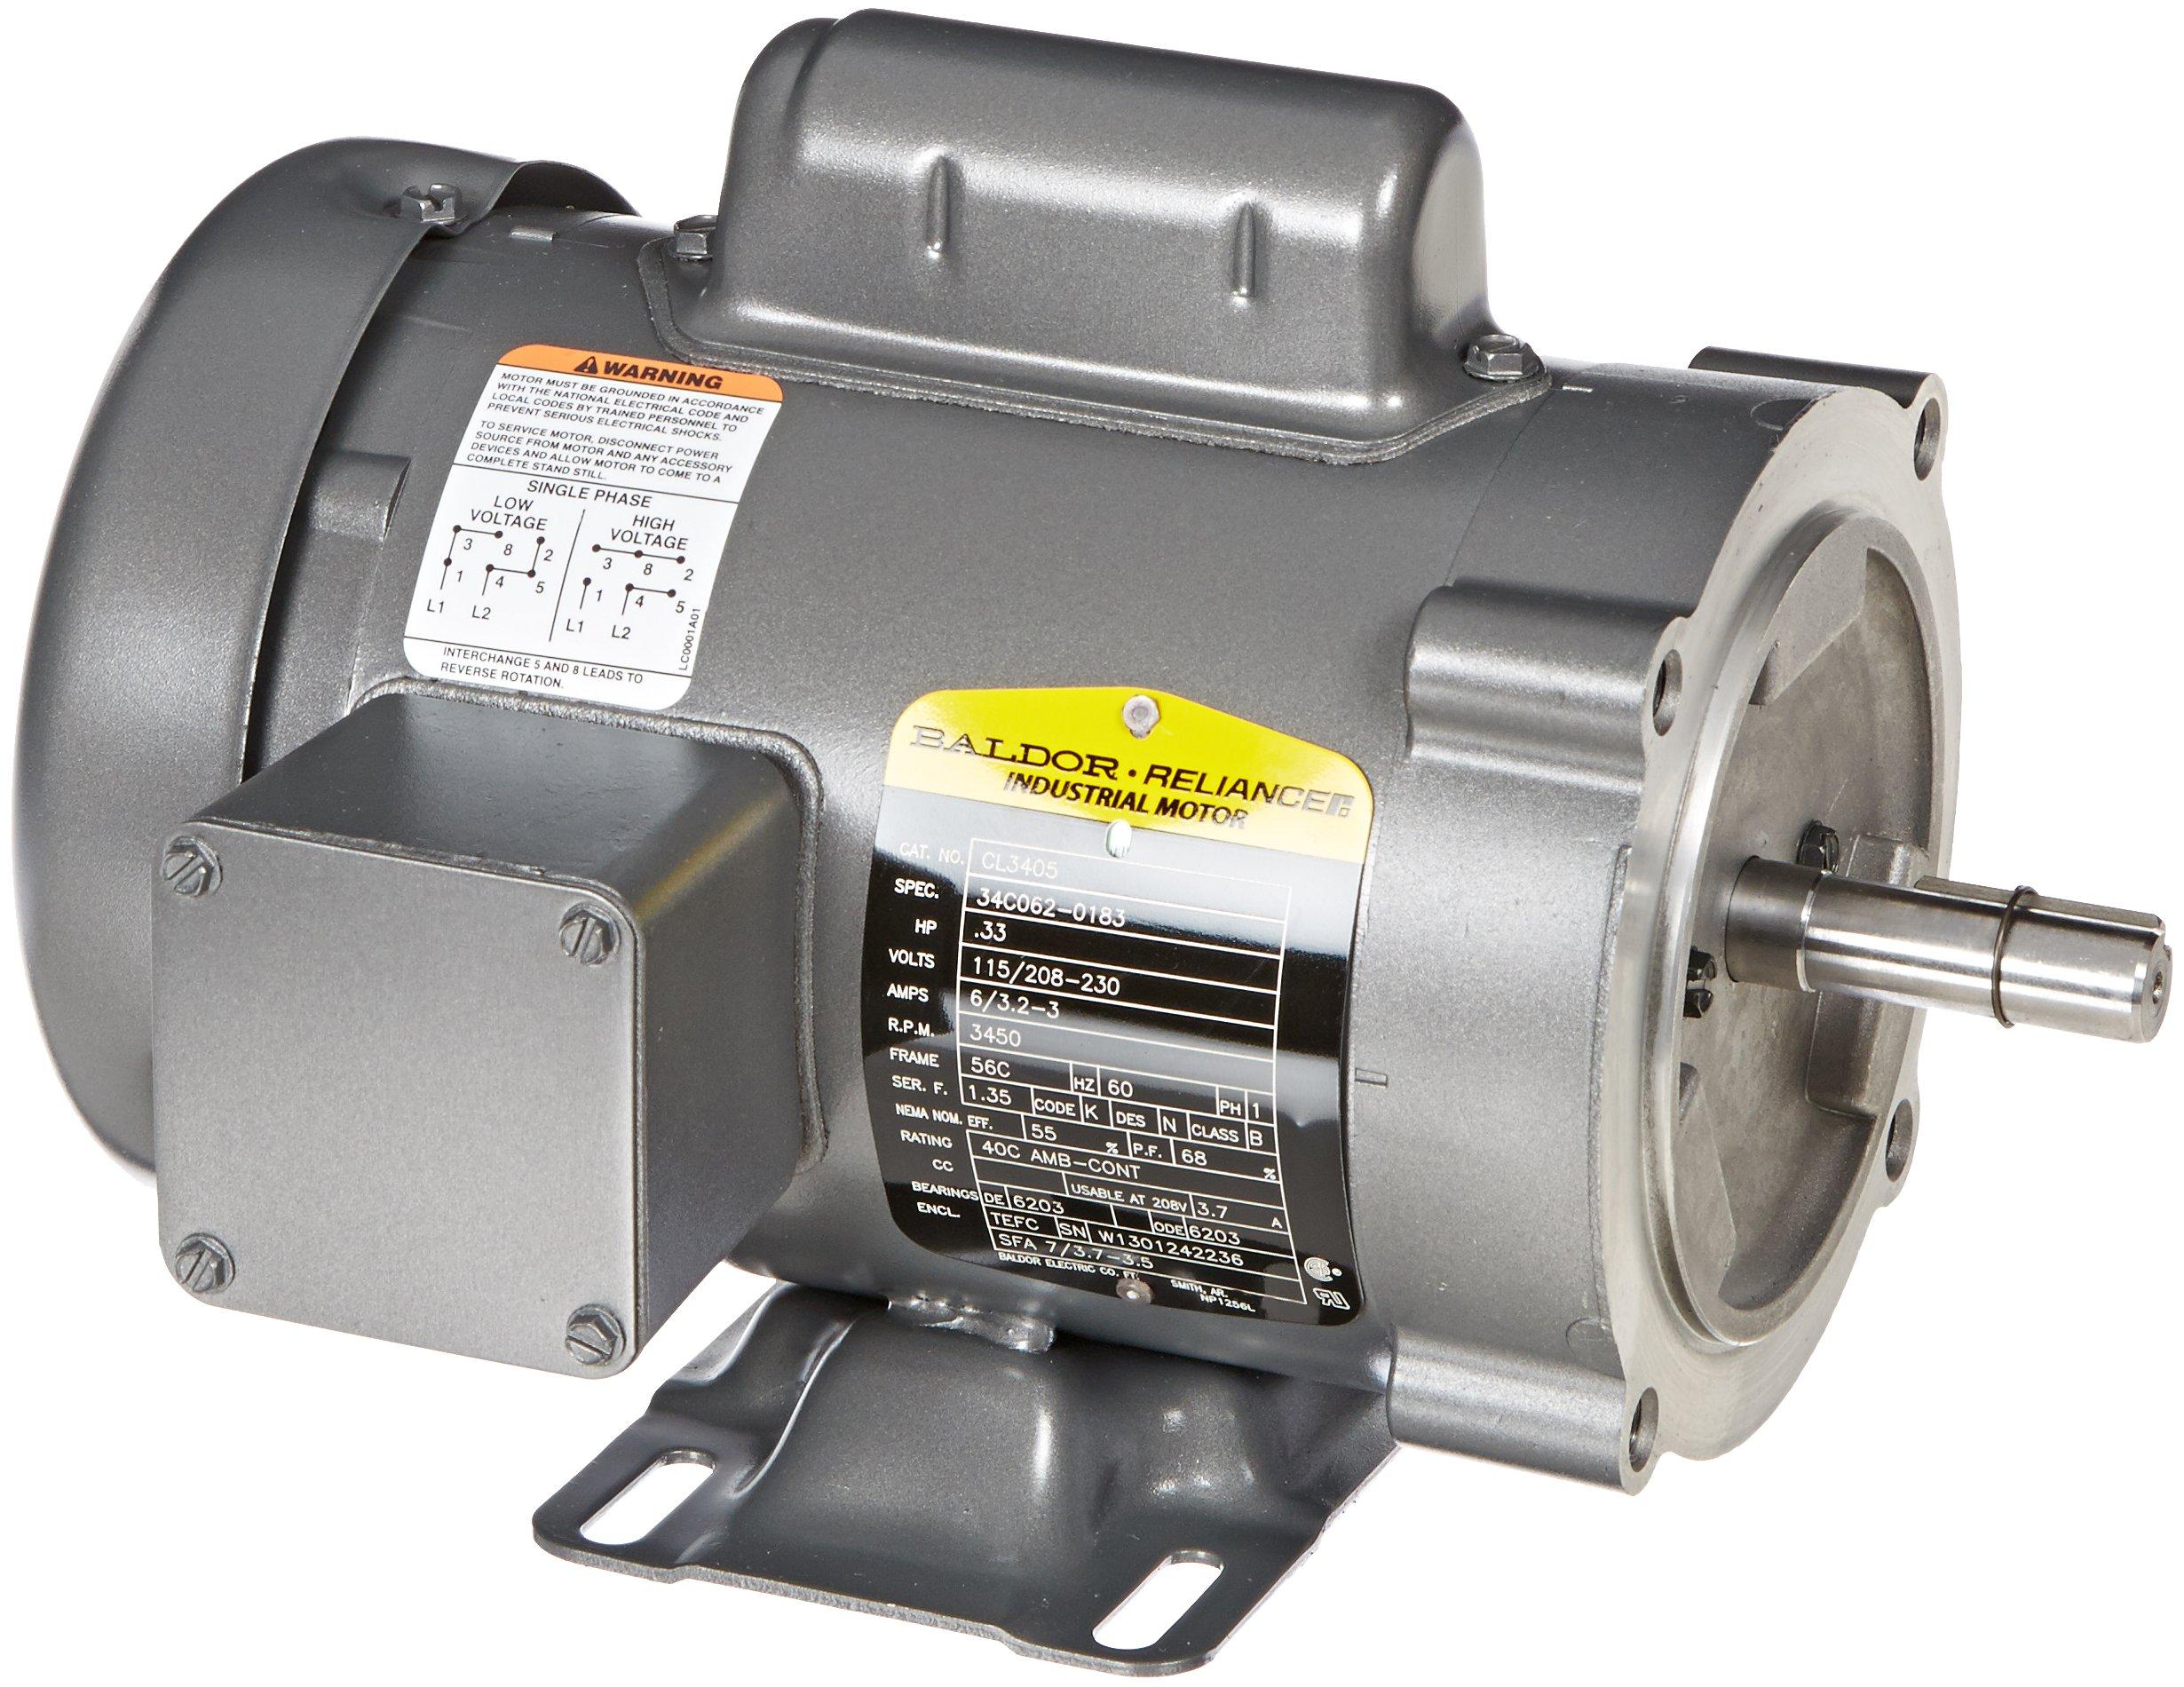 Baldor CL3405 General Purpose AC Motor, Single Phase, 56C Frame, TEFC Enclosure, 33/100Hp Output, 3450rpm, 60Hz, 115/208-230V Voltage